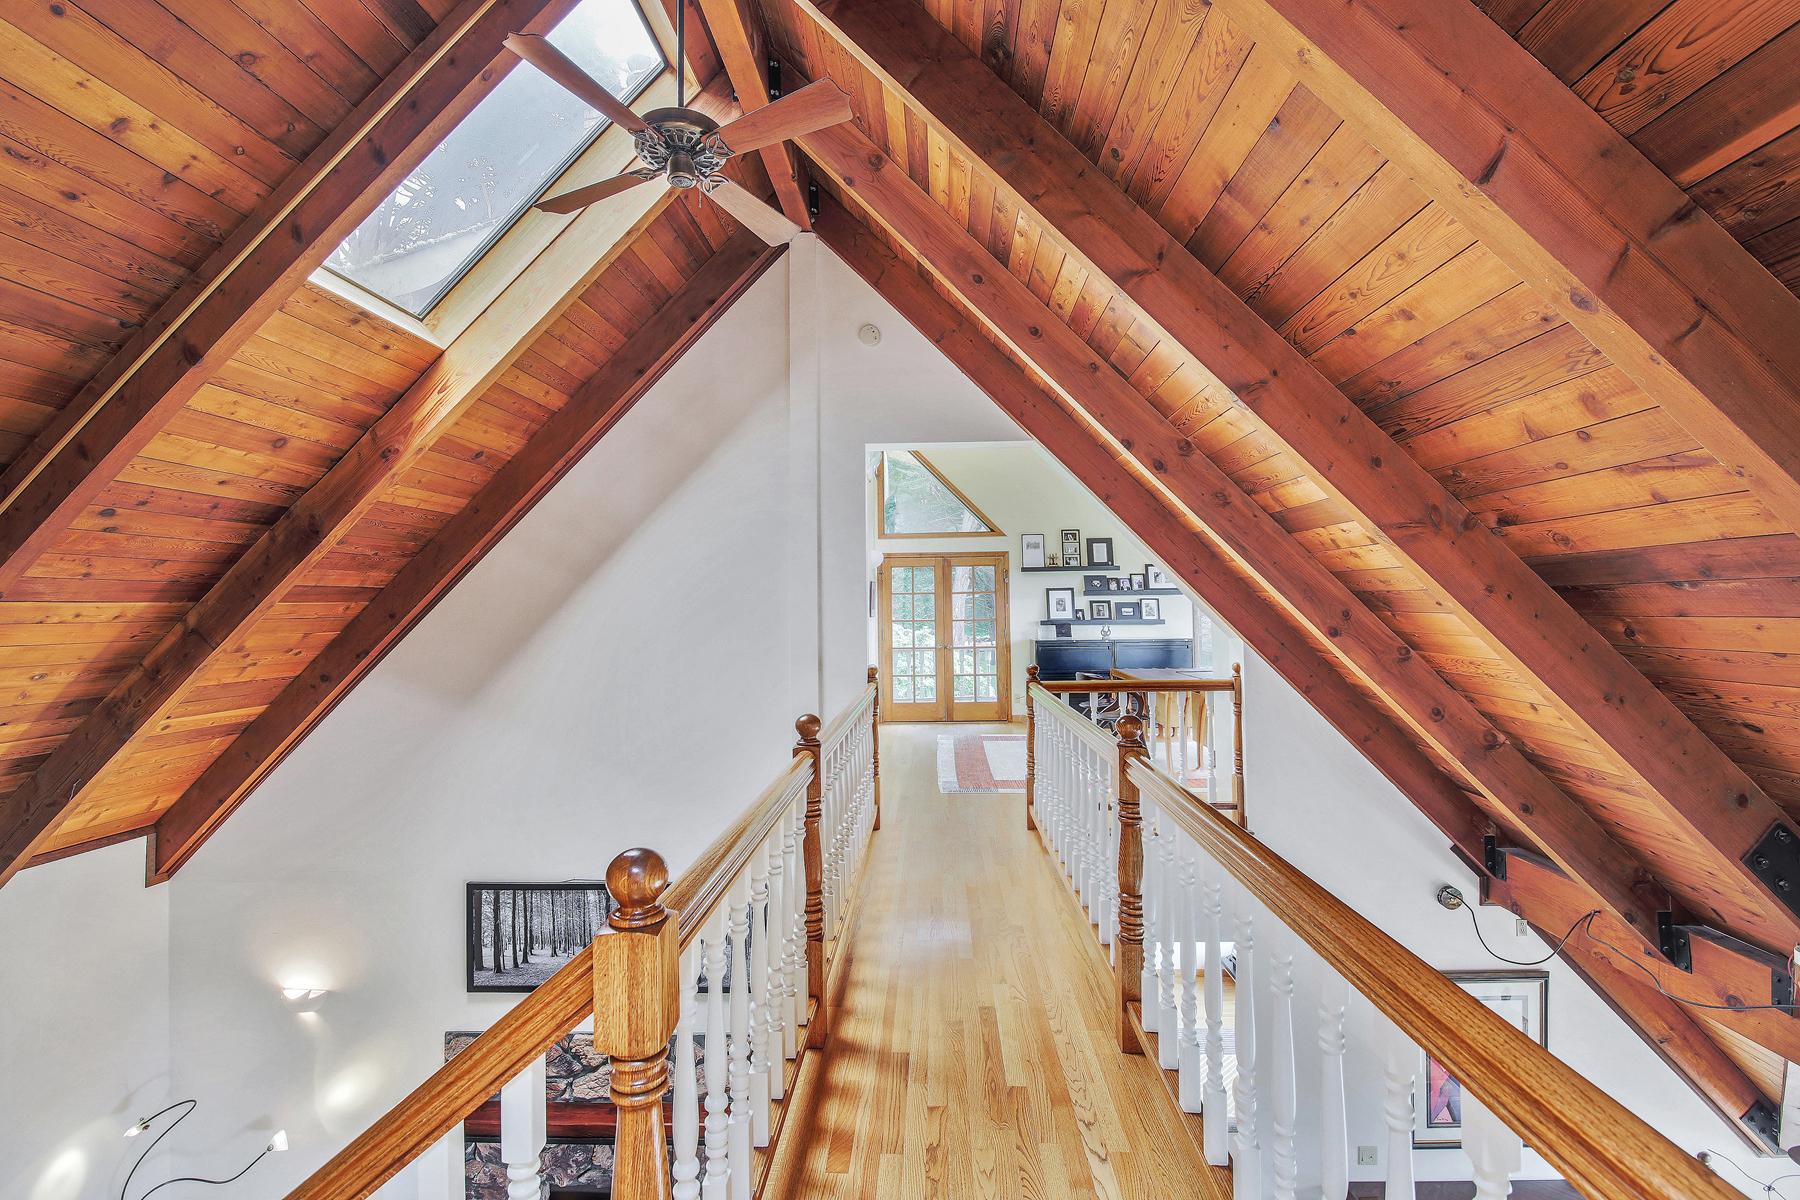 Additional photo for property listing at 1300 Alamo 1300 Alamo St. Montara, California 94037 United States